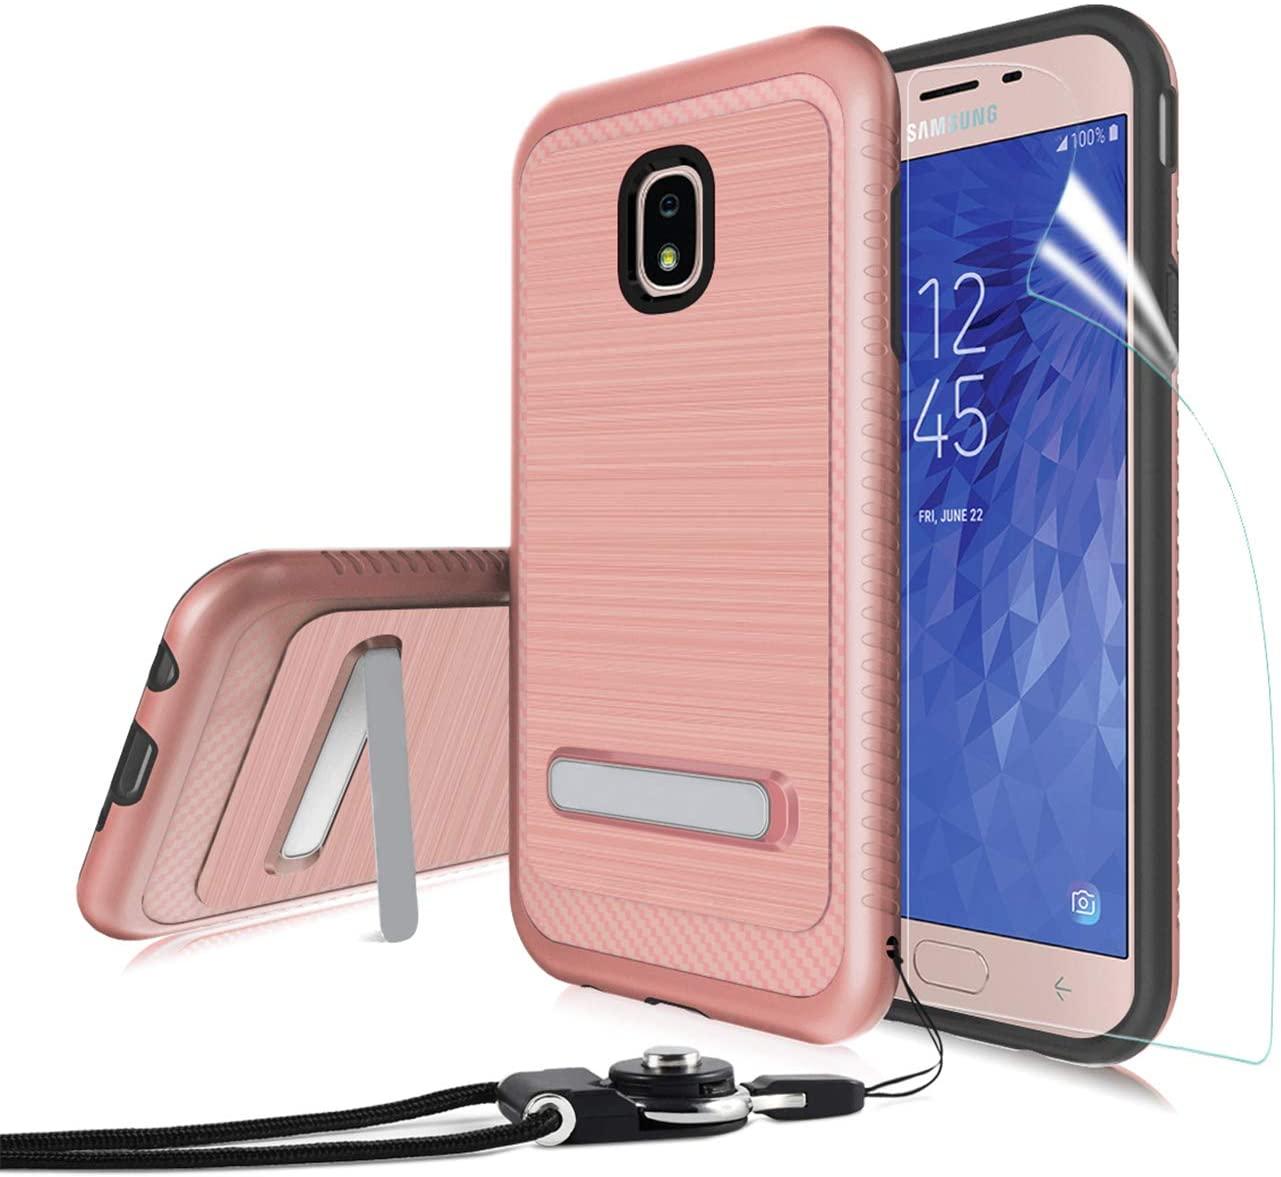 Wallme Samsung Galaxy J3/J3 2018 Case,J3 Orbit/J3 Achieve/Express Prime3 w/ Tempered Glass Screen Protector & Stand [Dual Layer] Phone Case-Rosegold